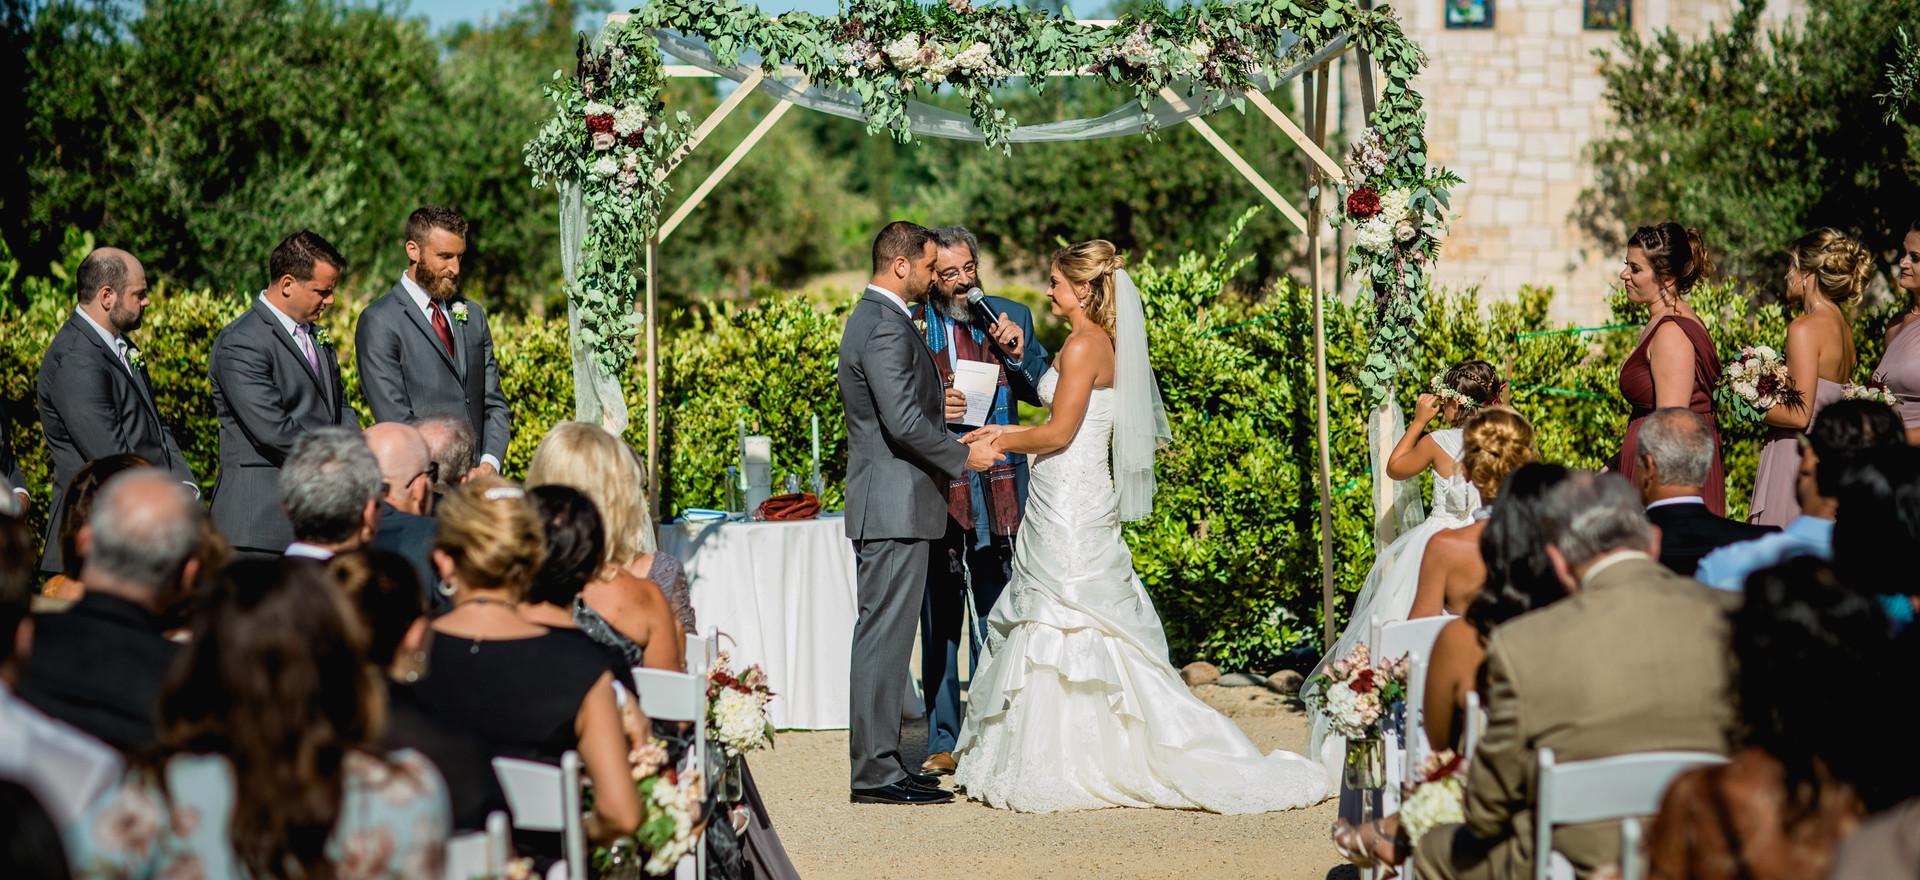 Greg+Colleen ~ Married_336.jpg